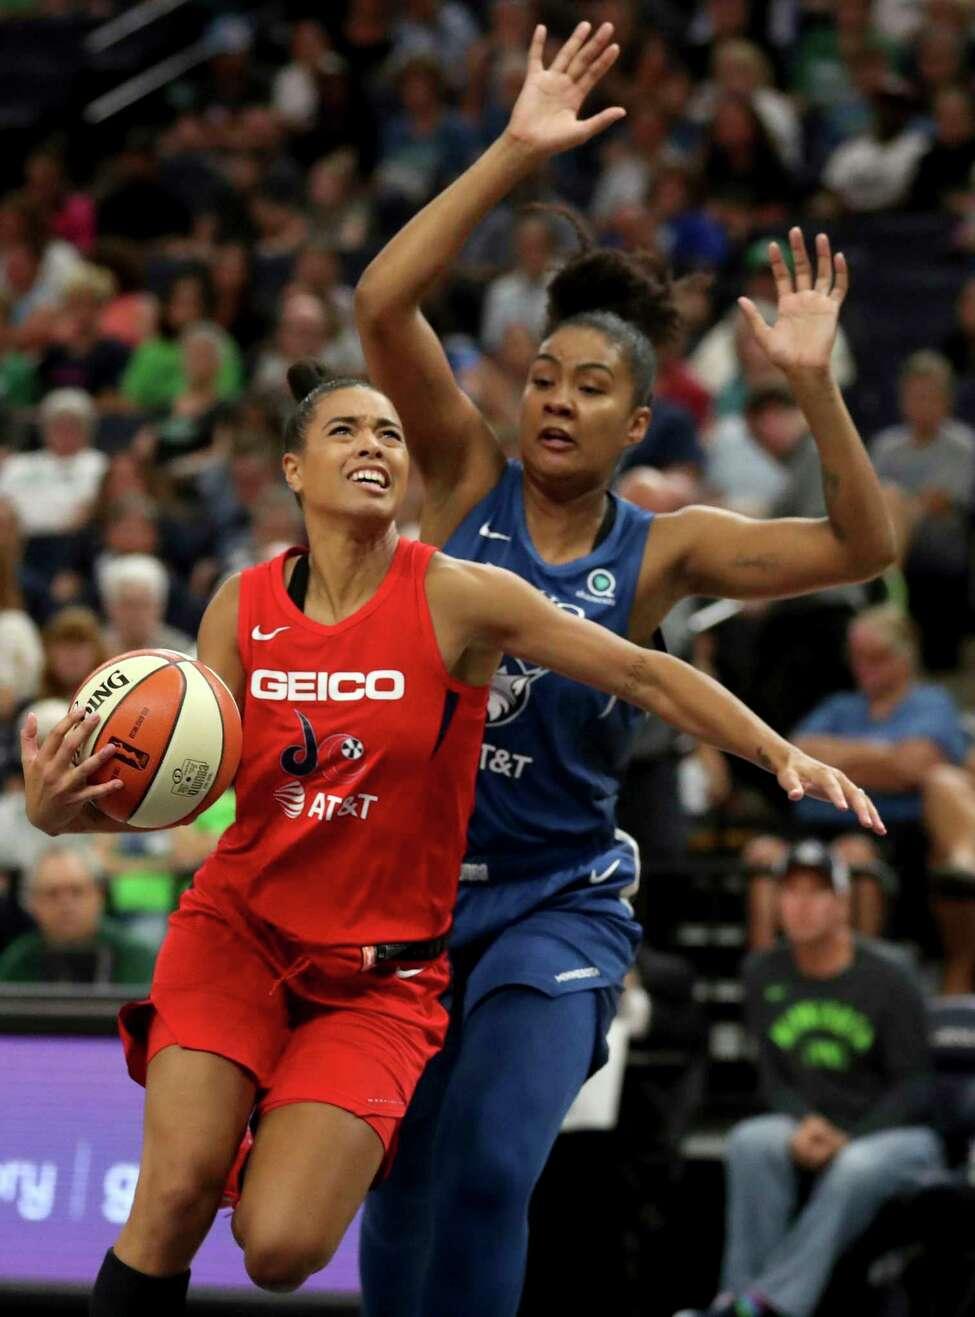 Minnesota Lynx's Damiris Dantas, right, defends against Washington Mystics' Natasha Cloud (9) during the second half of a WNBA basketball game Friday, Aug. 16, 2019, in Minneapolis. (David Joles/Star Tribune via AP)